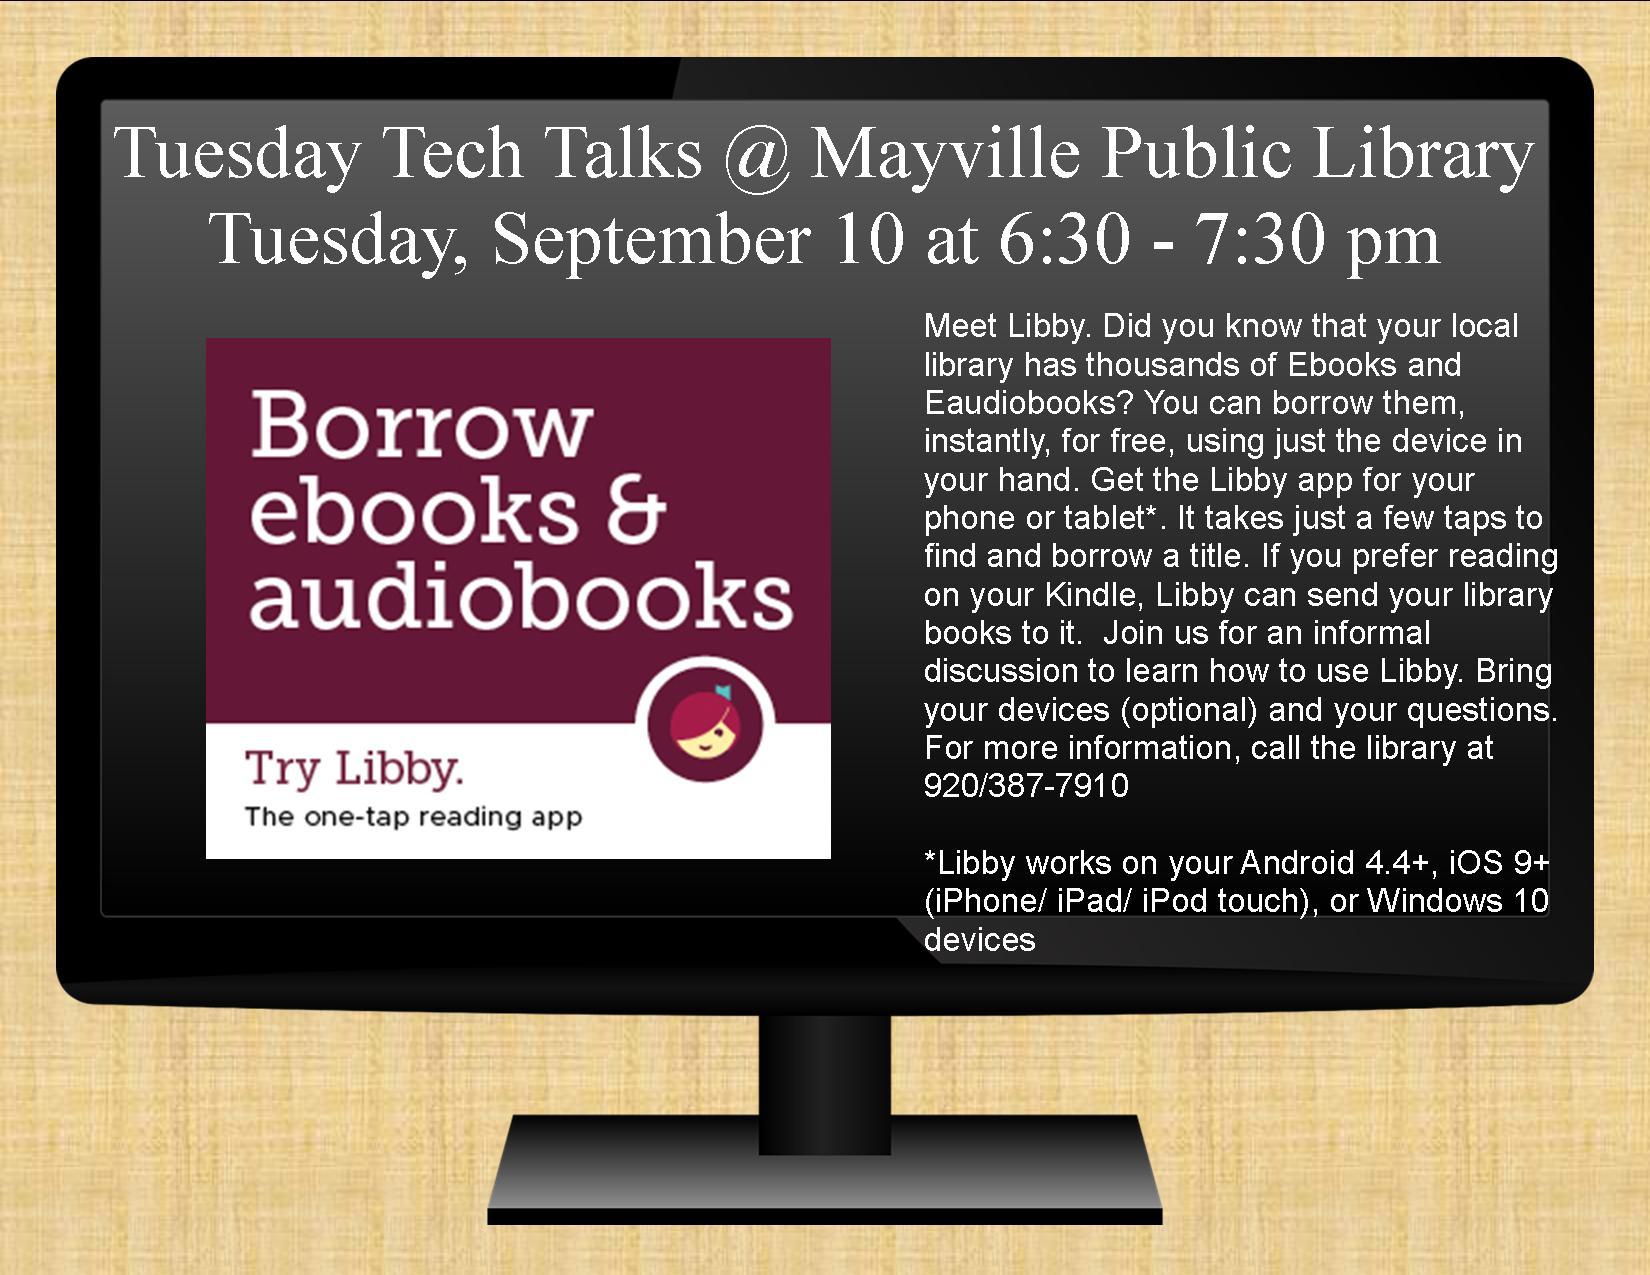 Tuesday Tech Talk - Meet Libby! @ Mayville Public Library